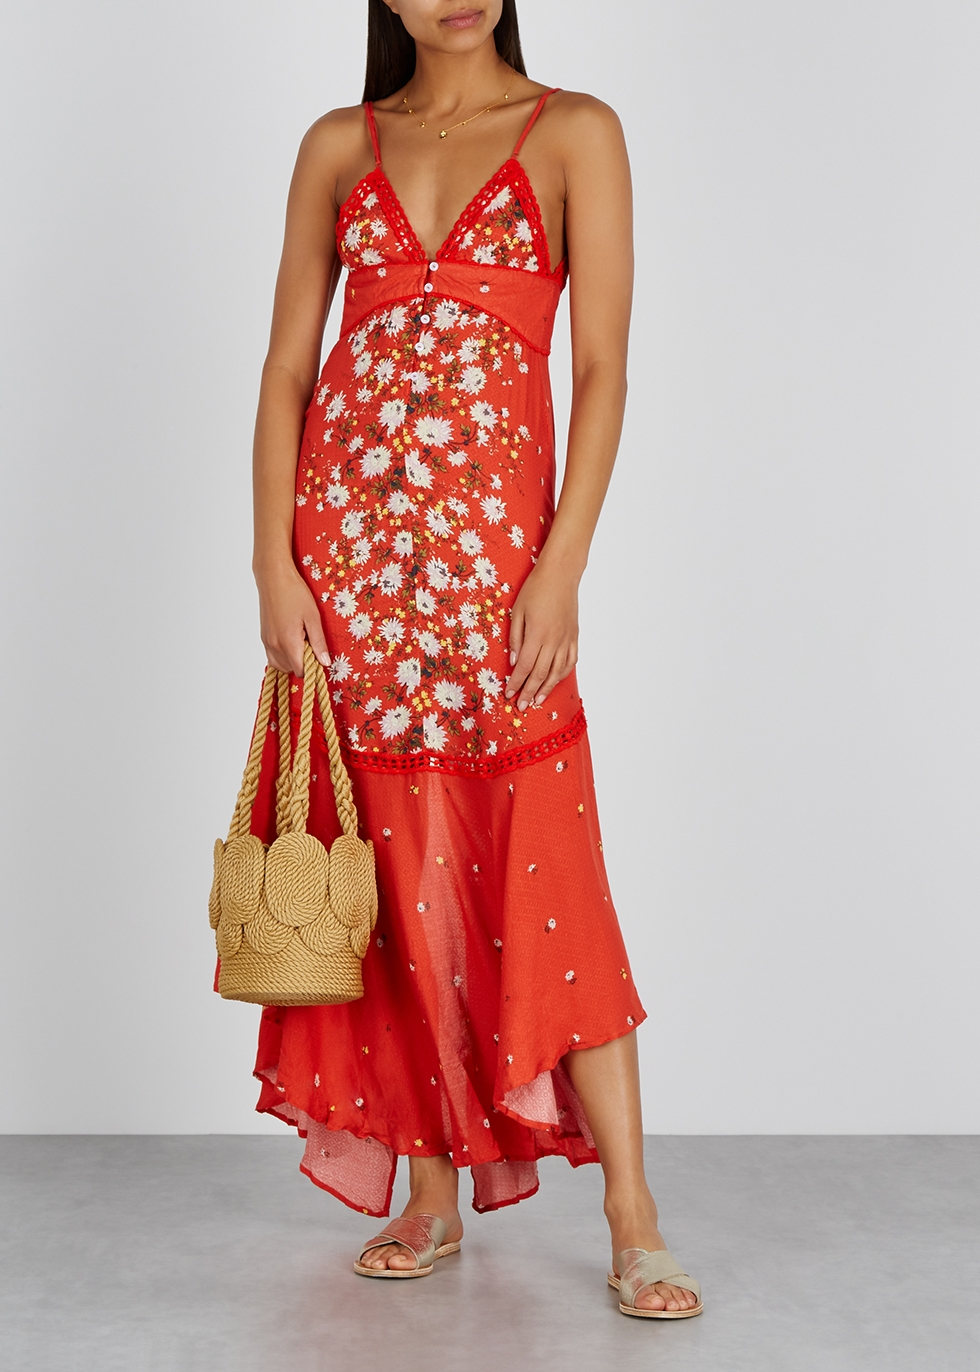 Paradise floral-print maxi dress - Free People